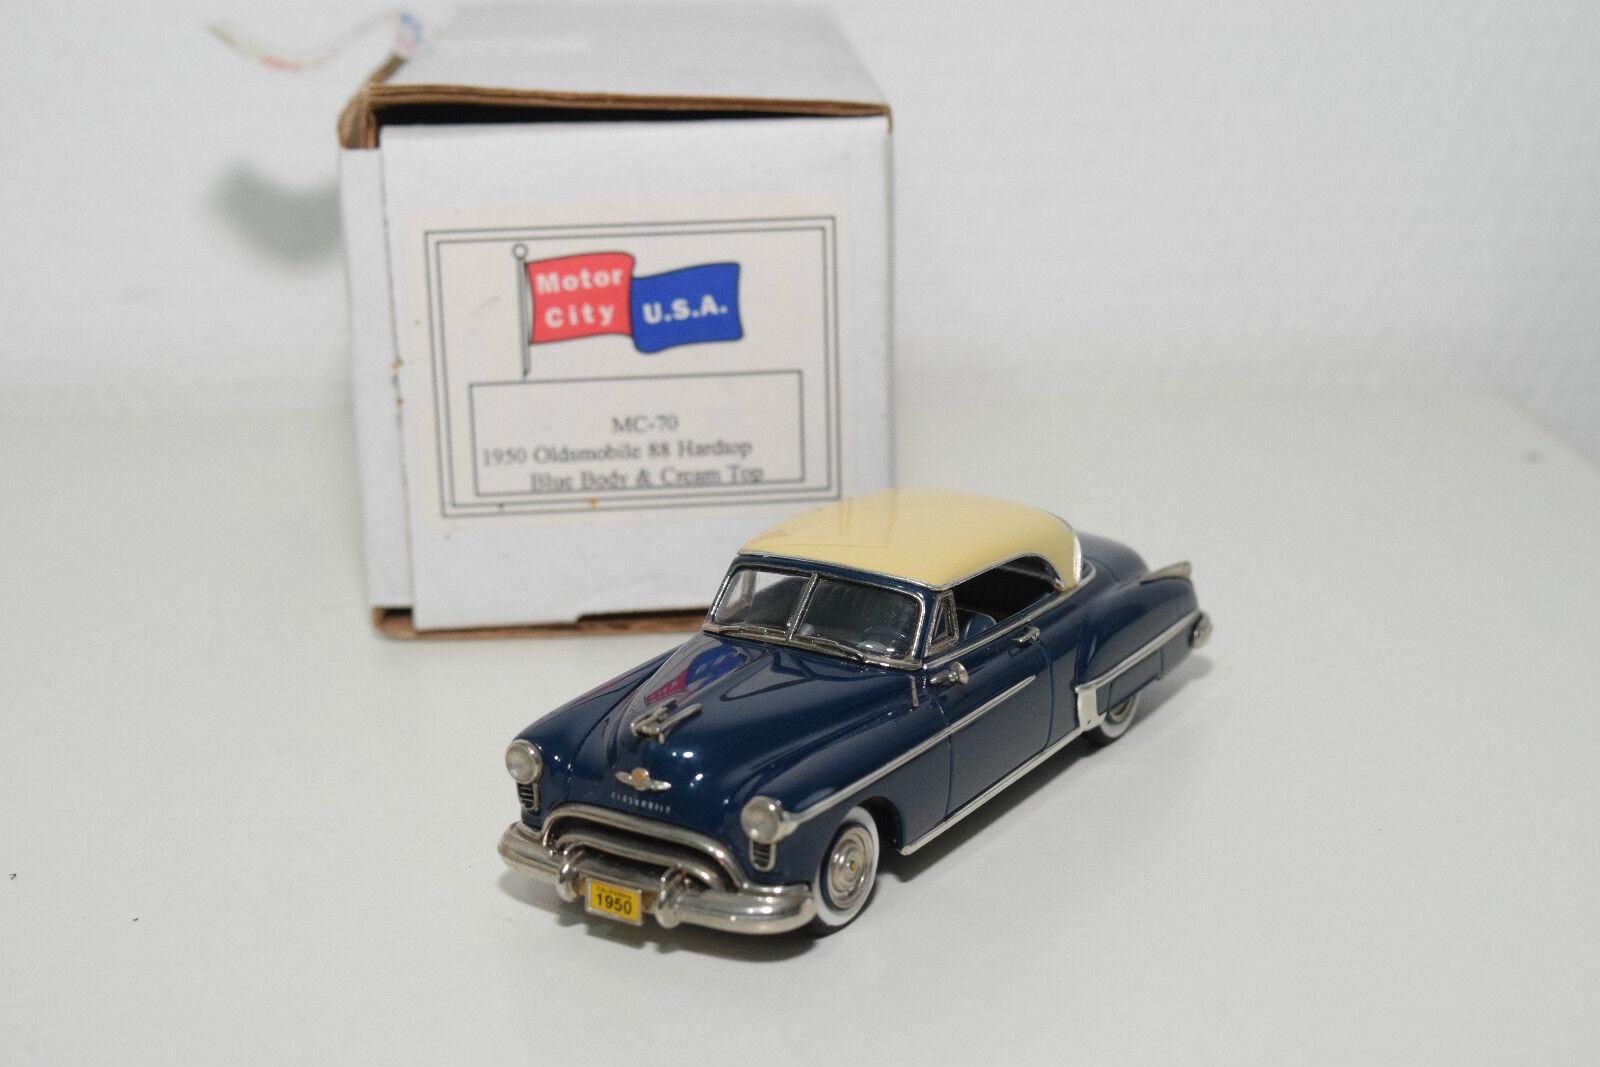 . U.S.A. models Motor City mc-70 Oldsmobile 88 HARD TOP 1950 blu MIB RARE